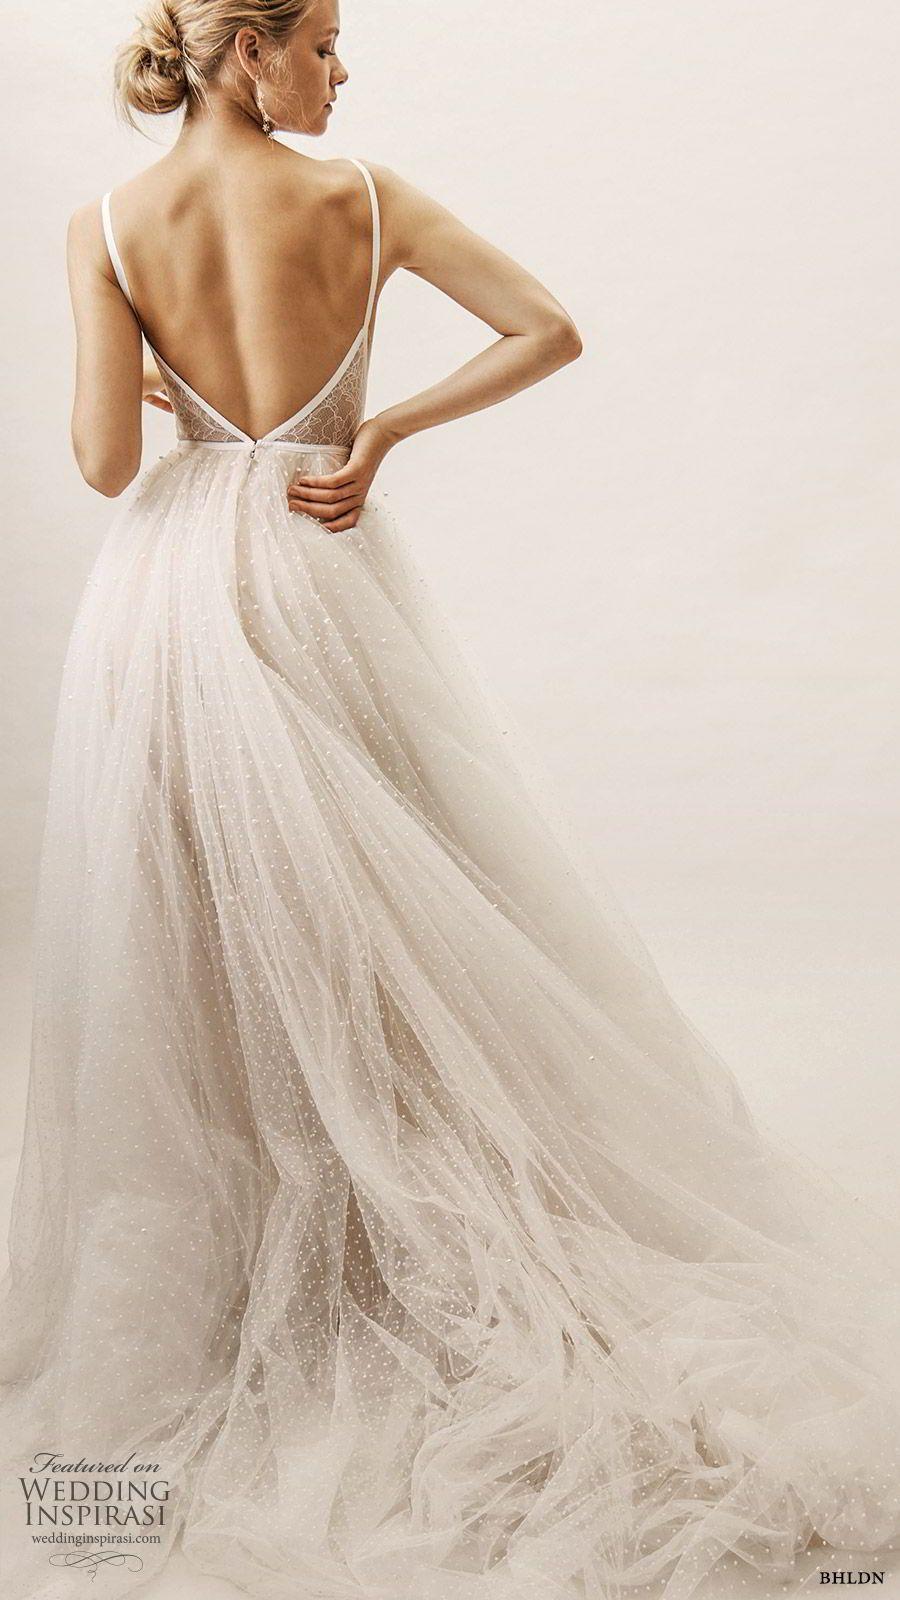 Photo of BHLDN's New Spring 2019 Wedding Dresses   Wedding Inspirasi